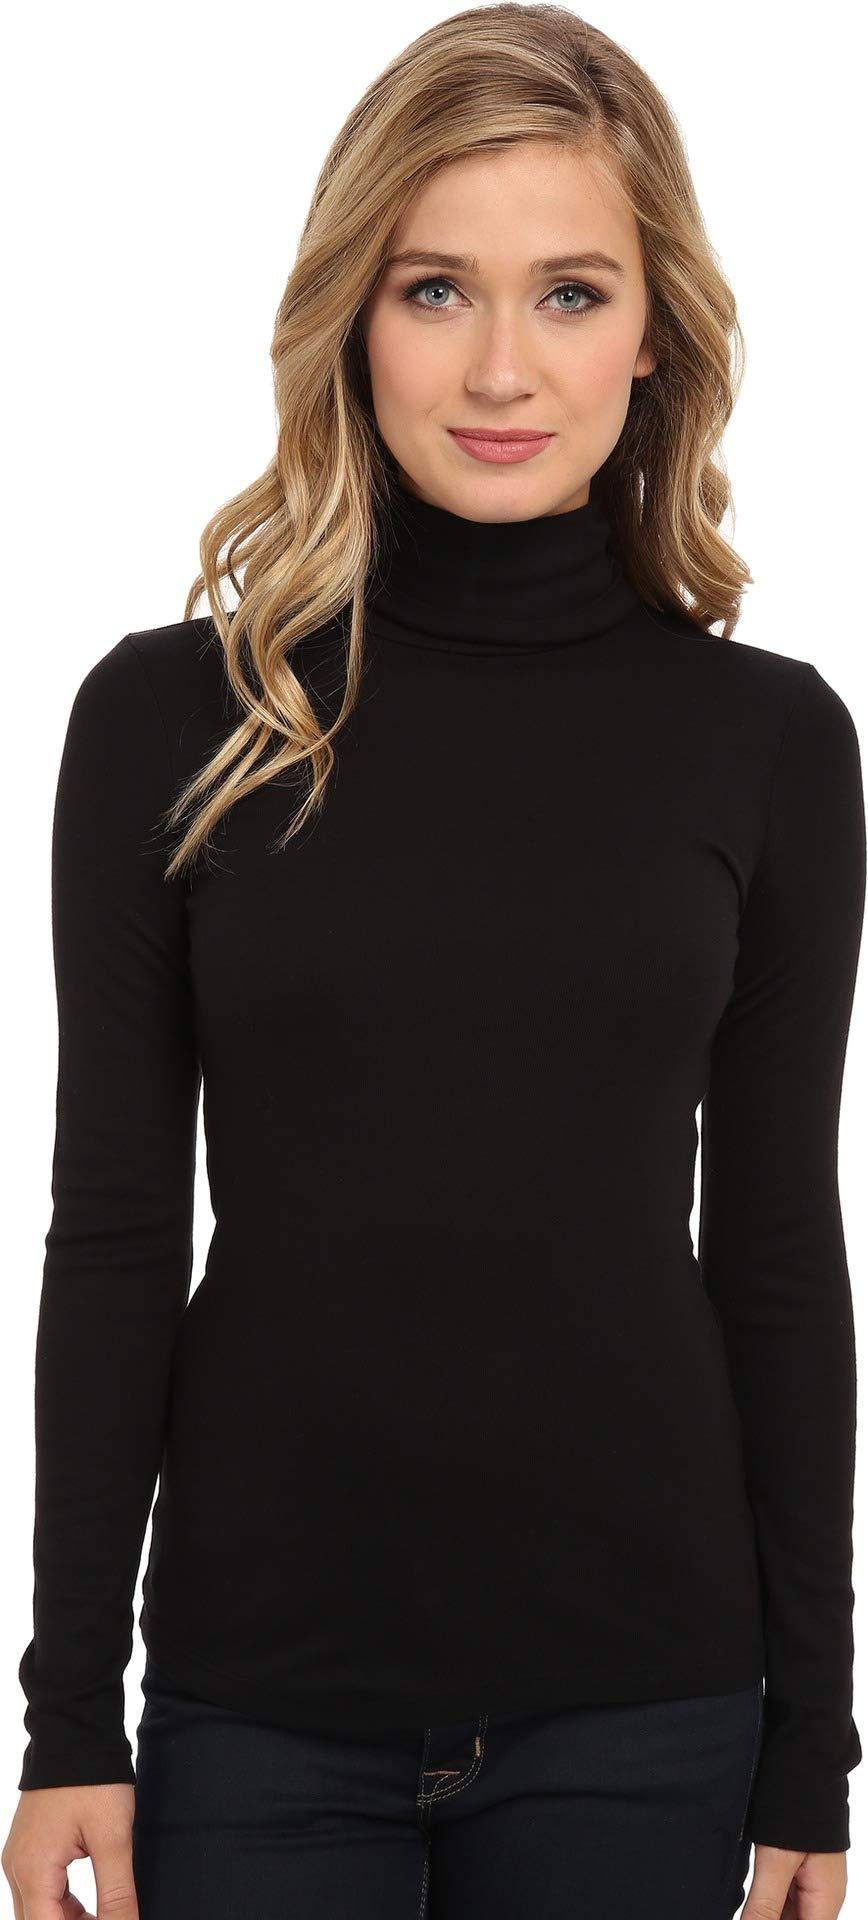 Splendid Women's 1X1 Long Sleeve Turtleneck Top,Black,Medium by Splendid